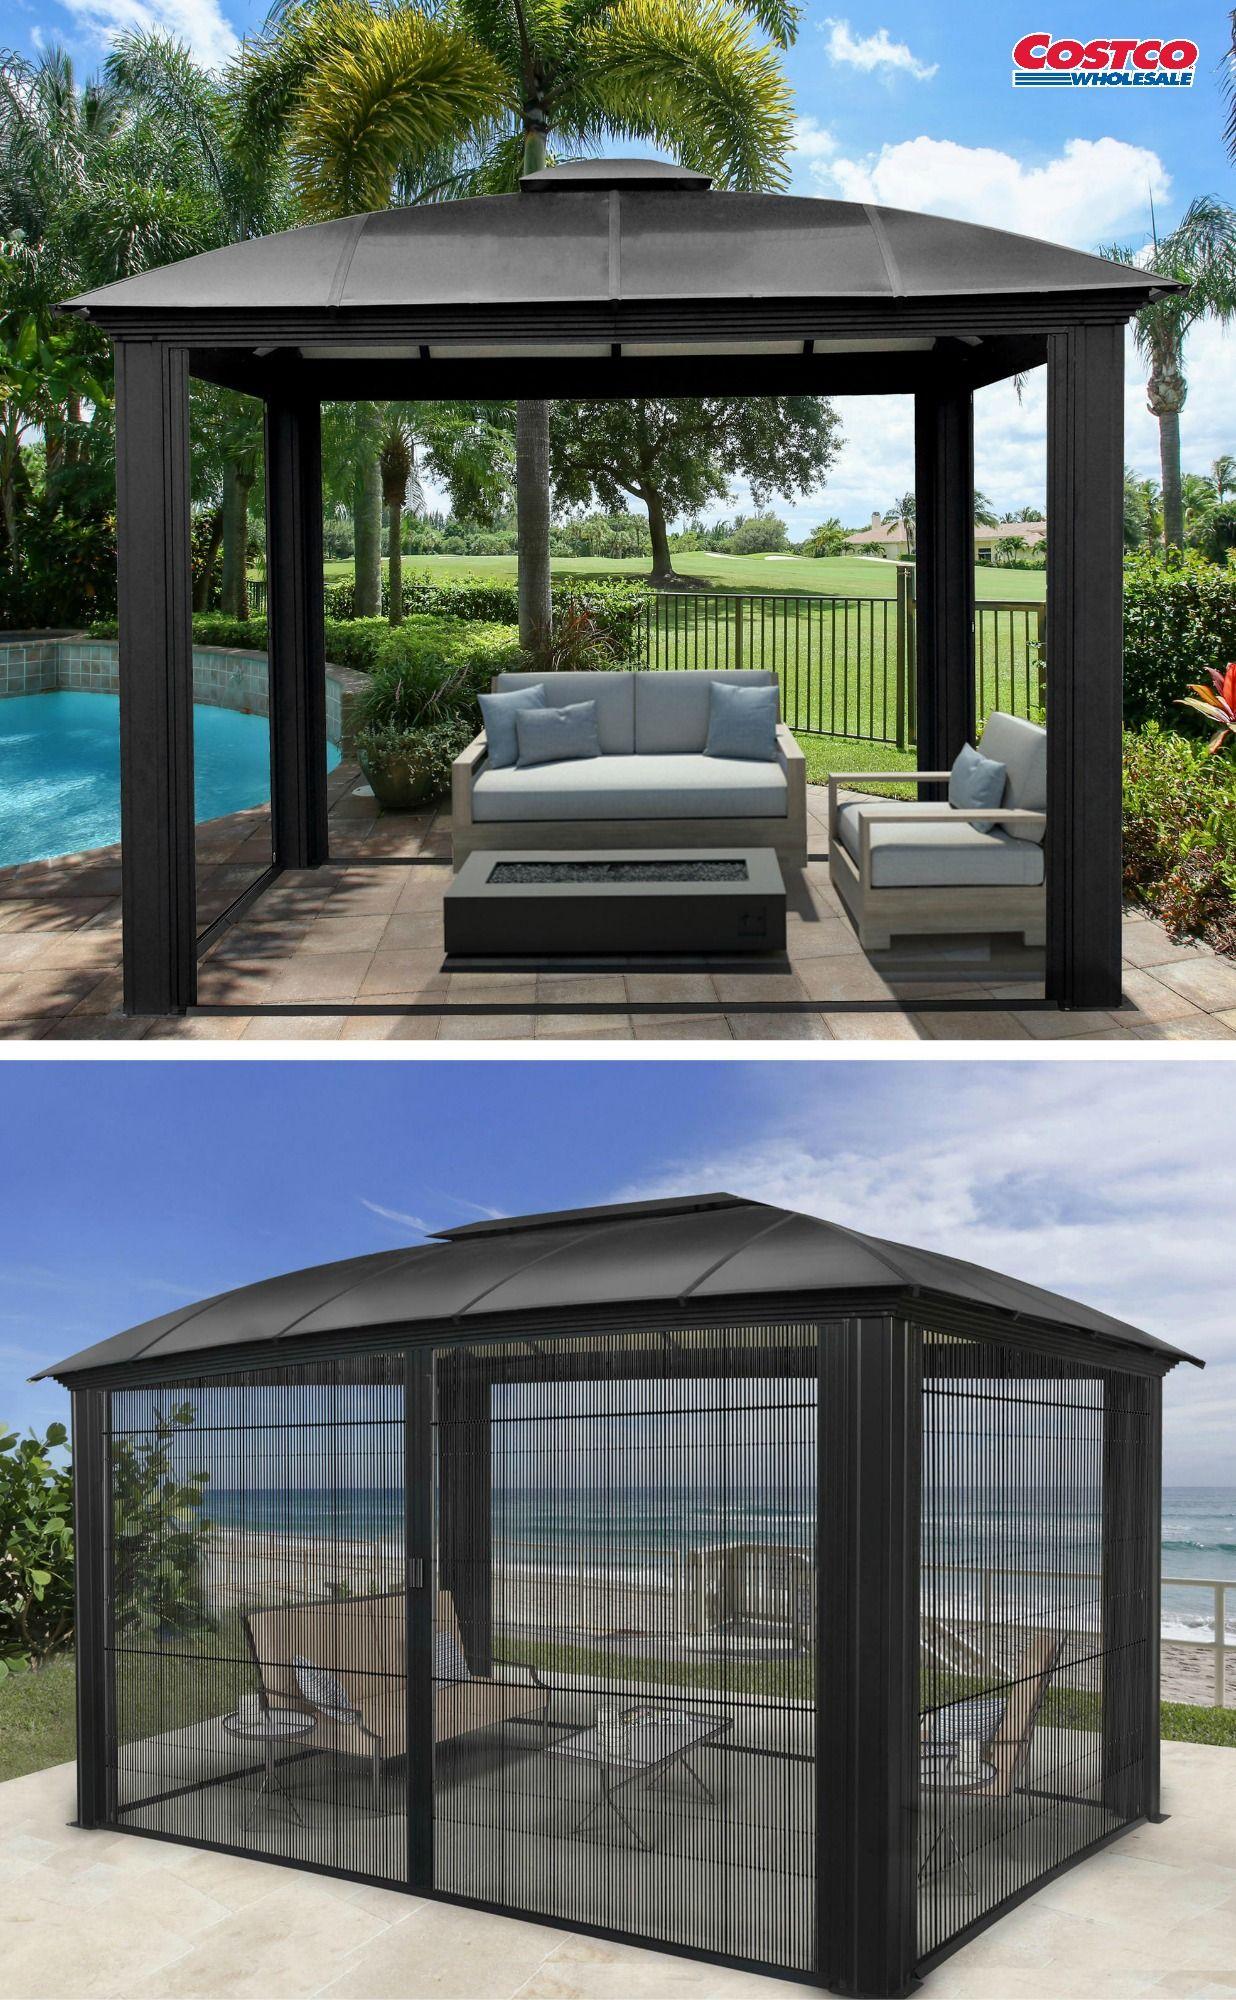 enclosed pergola designs on siena aluminum gazebo by paragon outdoor patio gazebo aluminum gazebo backyard gazebo siena aluminum gazebo by paragon